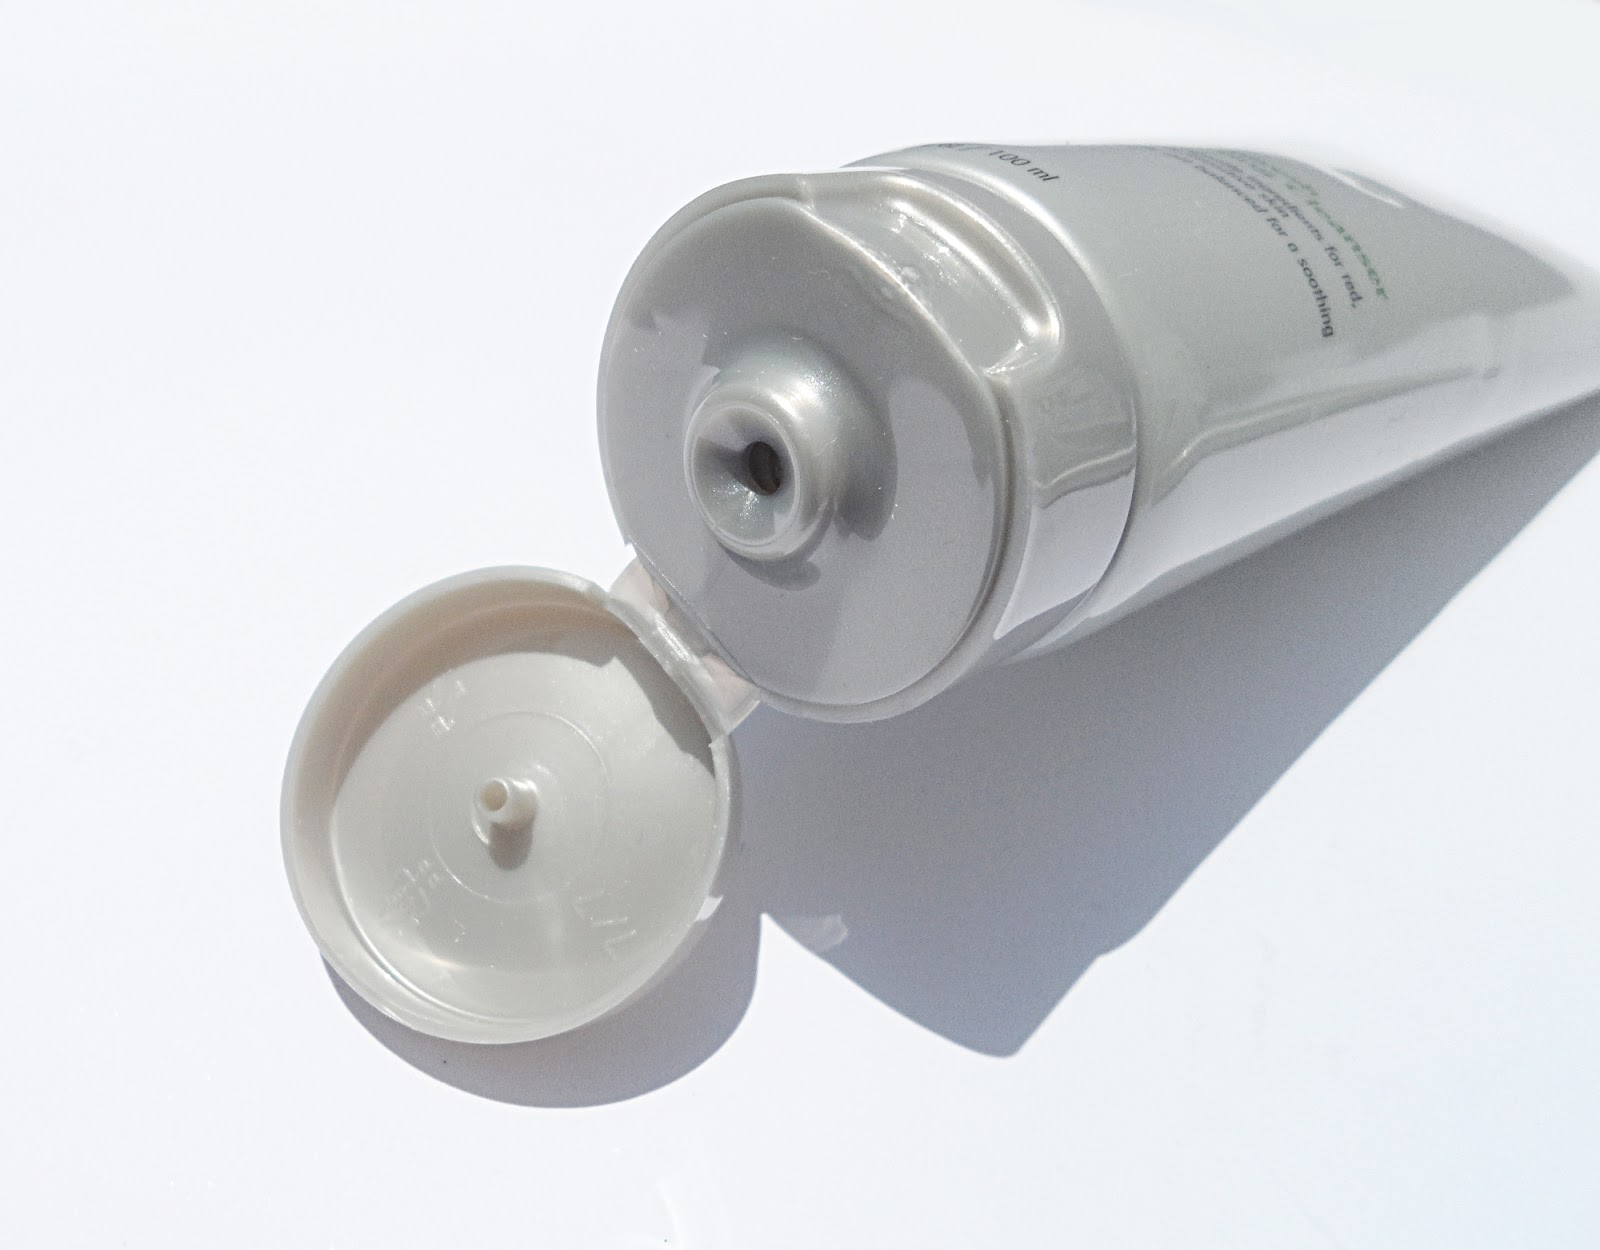 liz breygel stemology products skin care review blogger natural stemology cleanser ingredients buy online